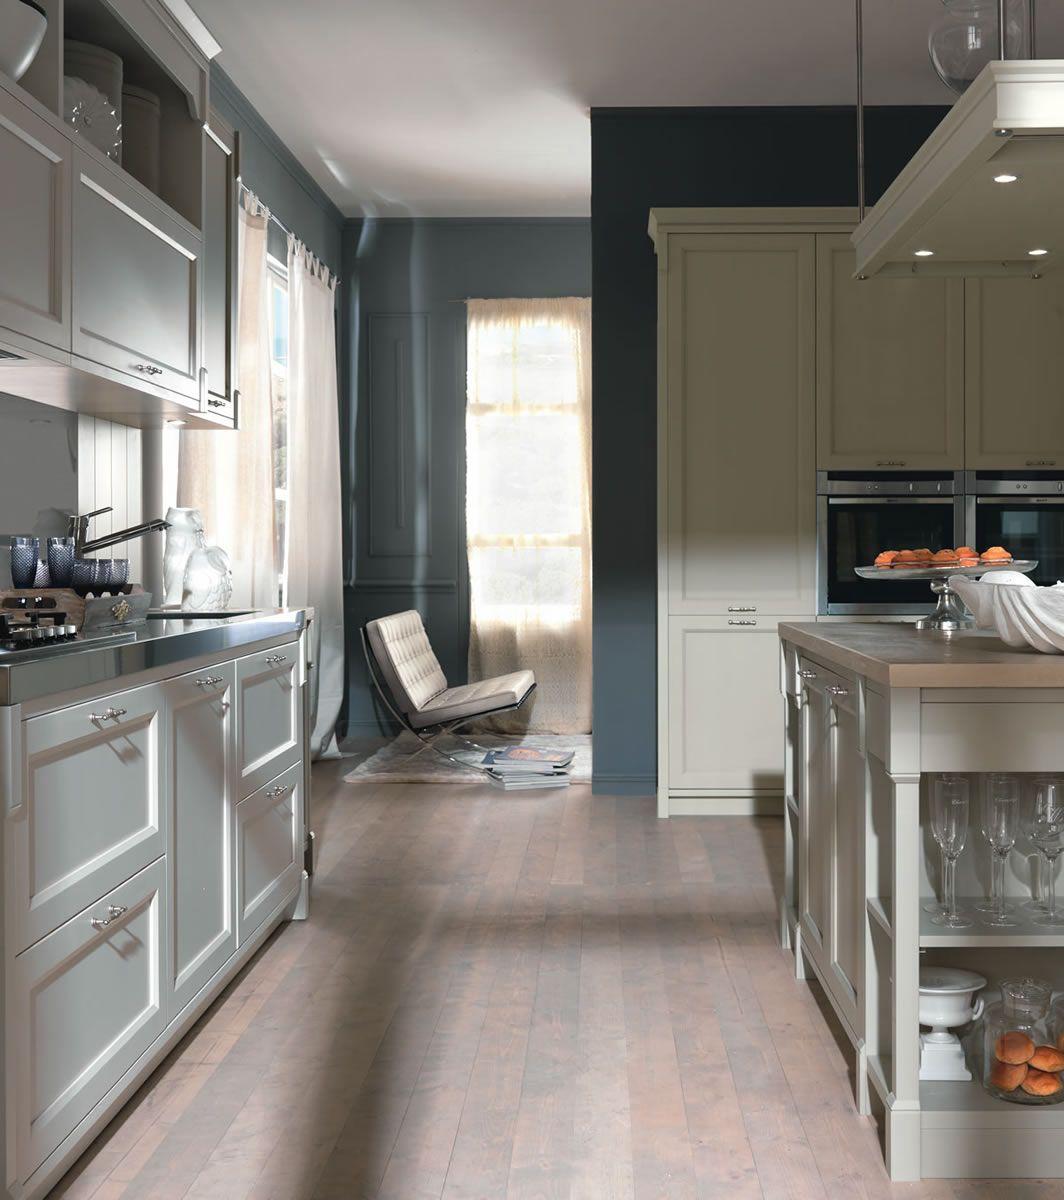 Cucine shabby chic cucina classica New Style cucine classiche in ...